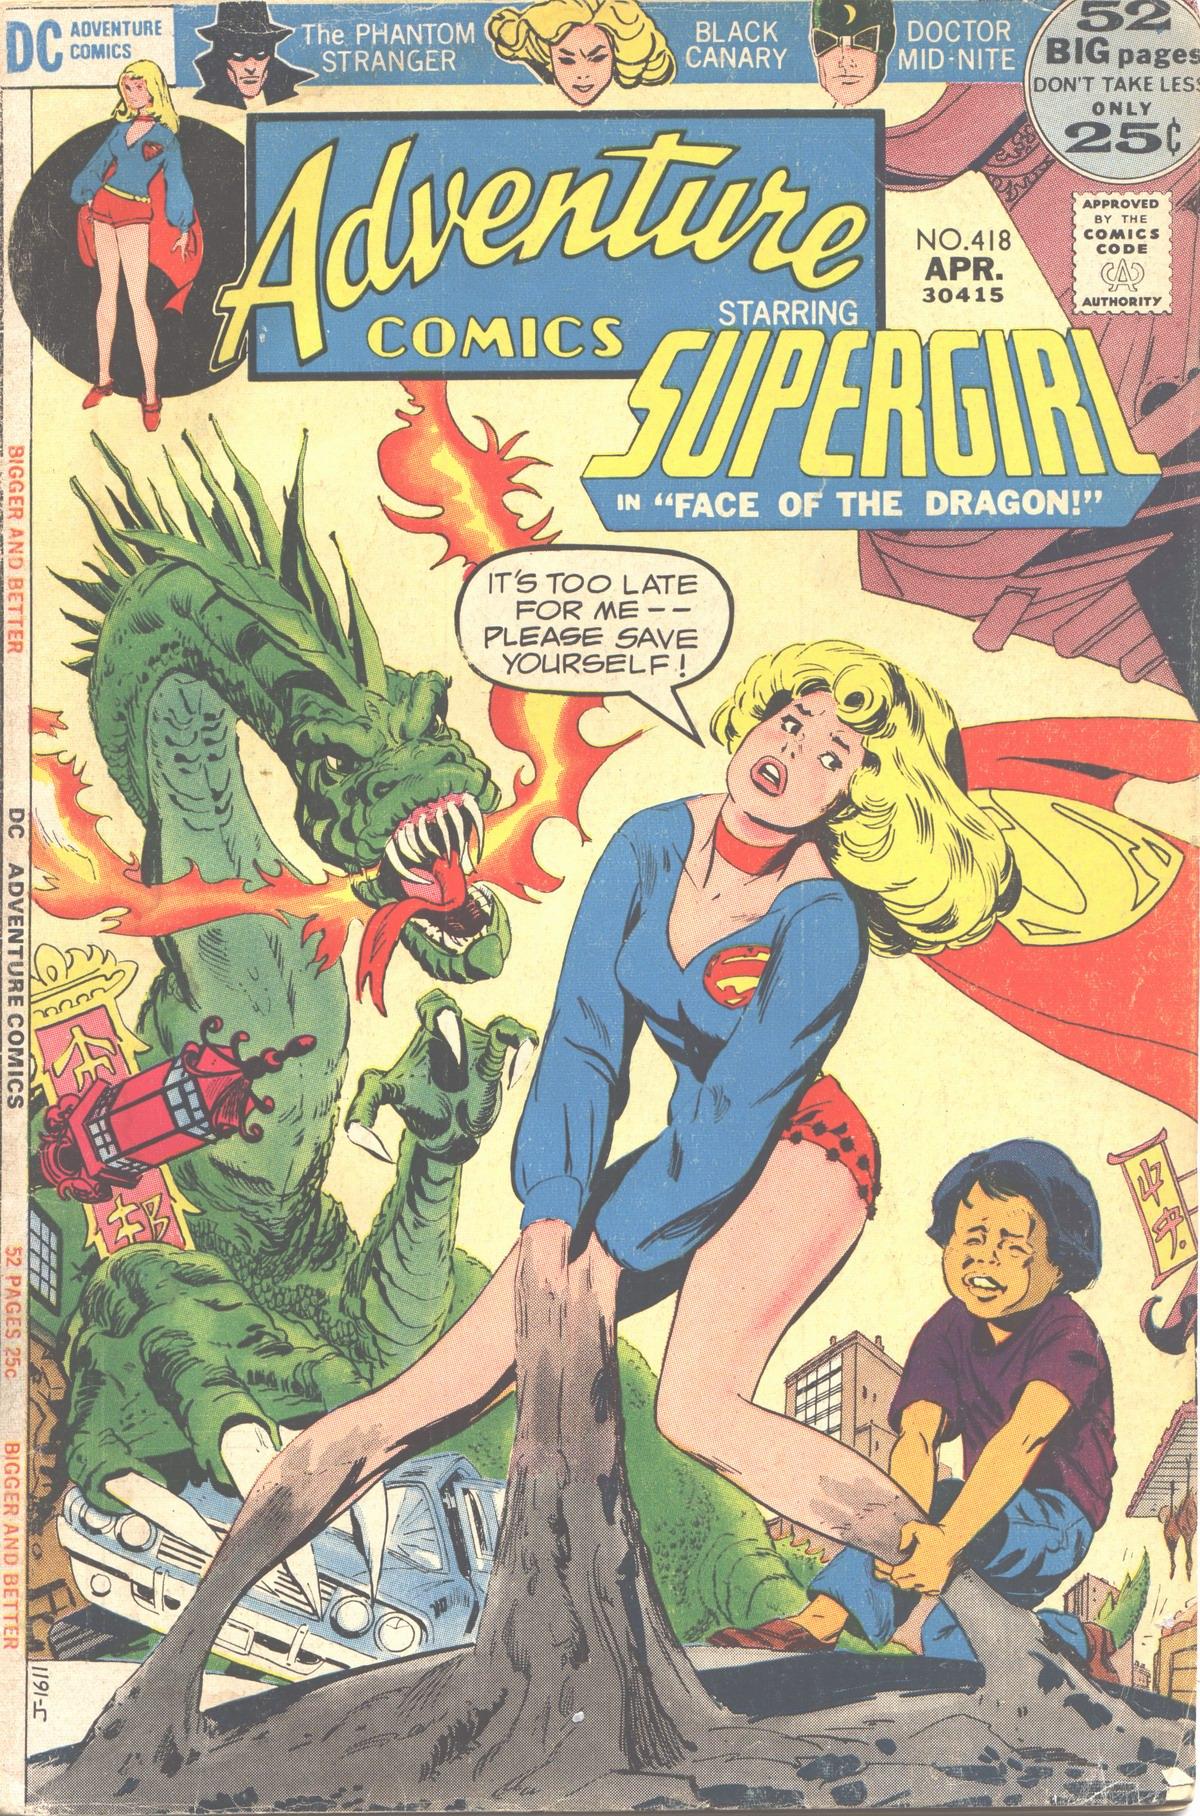 Read online Adventure Comics (1938) comic -  Issue #418 - 1